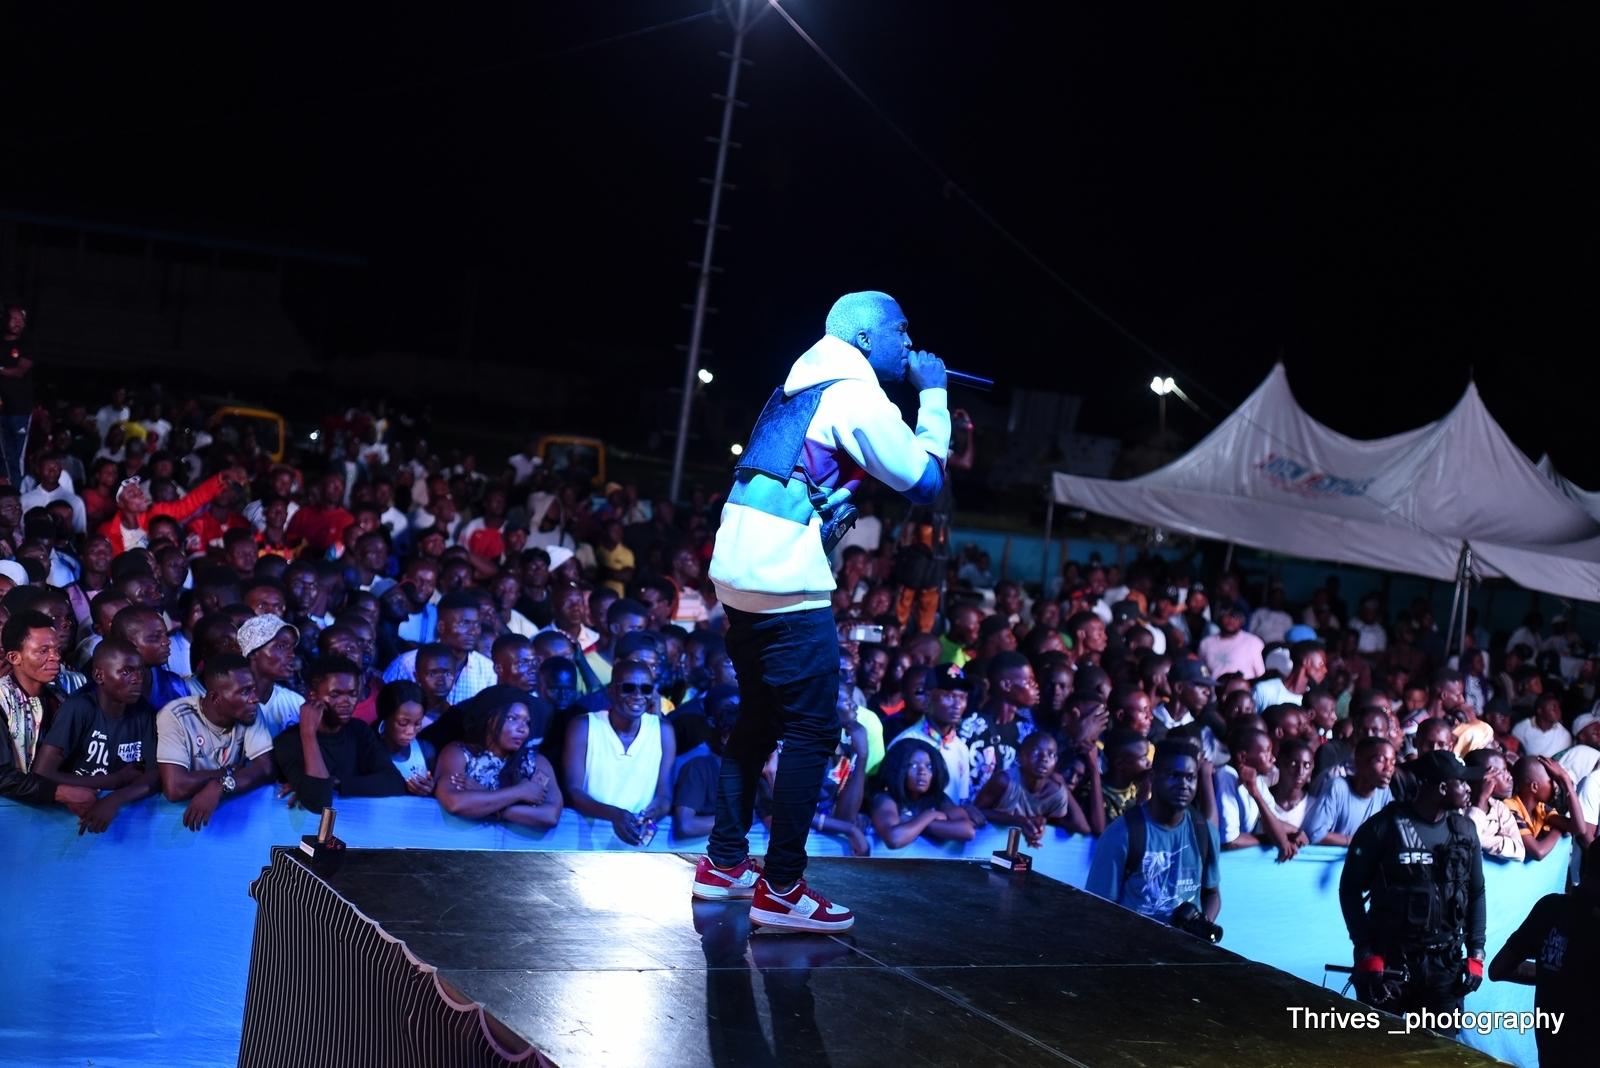 Artiste performing at Jumabee Inspires Concert 2021 held in Lokoja, Kogi State